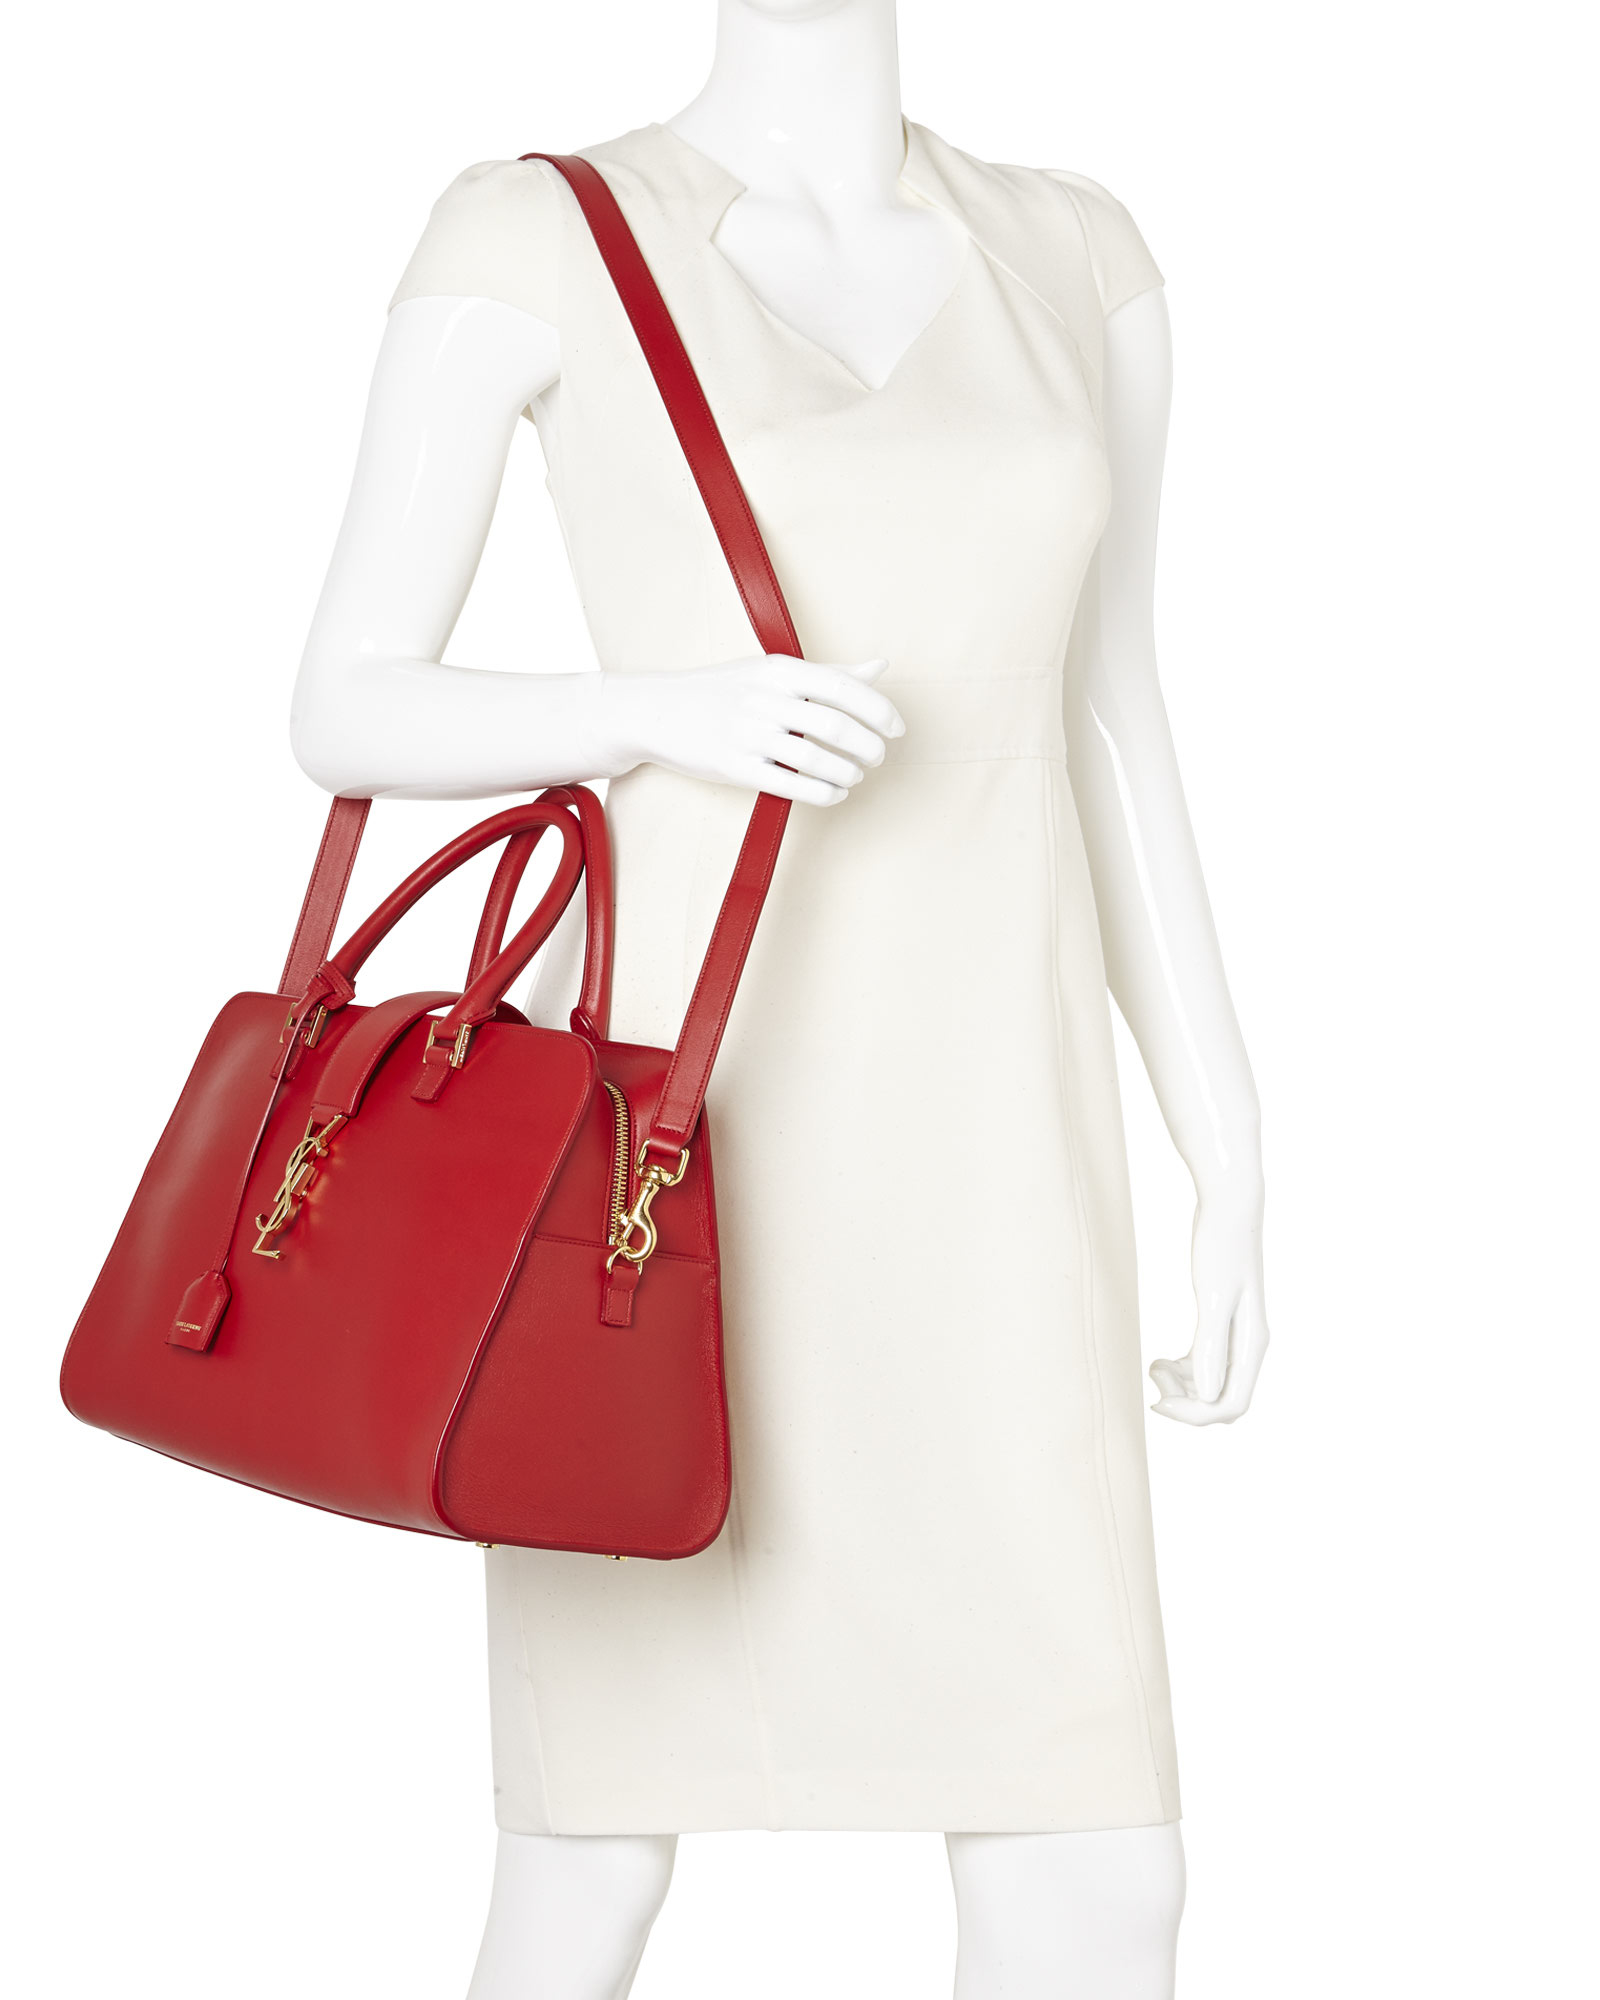 yves saint laurent chyc leather shoulder bag - Saint laurent Lipstick Red Cabas Monogram Medium Bag in Red | Lyst